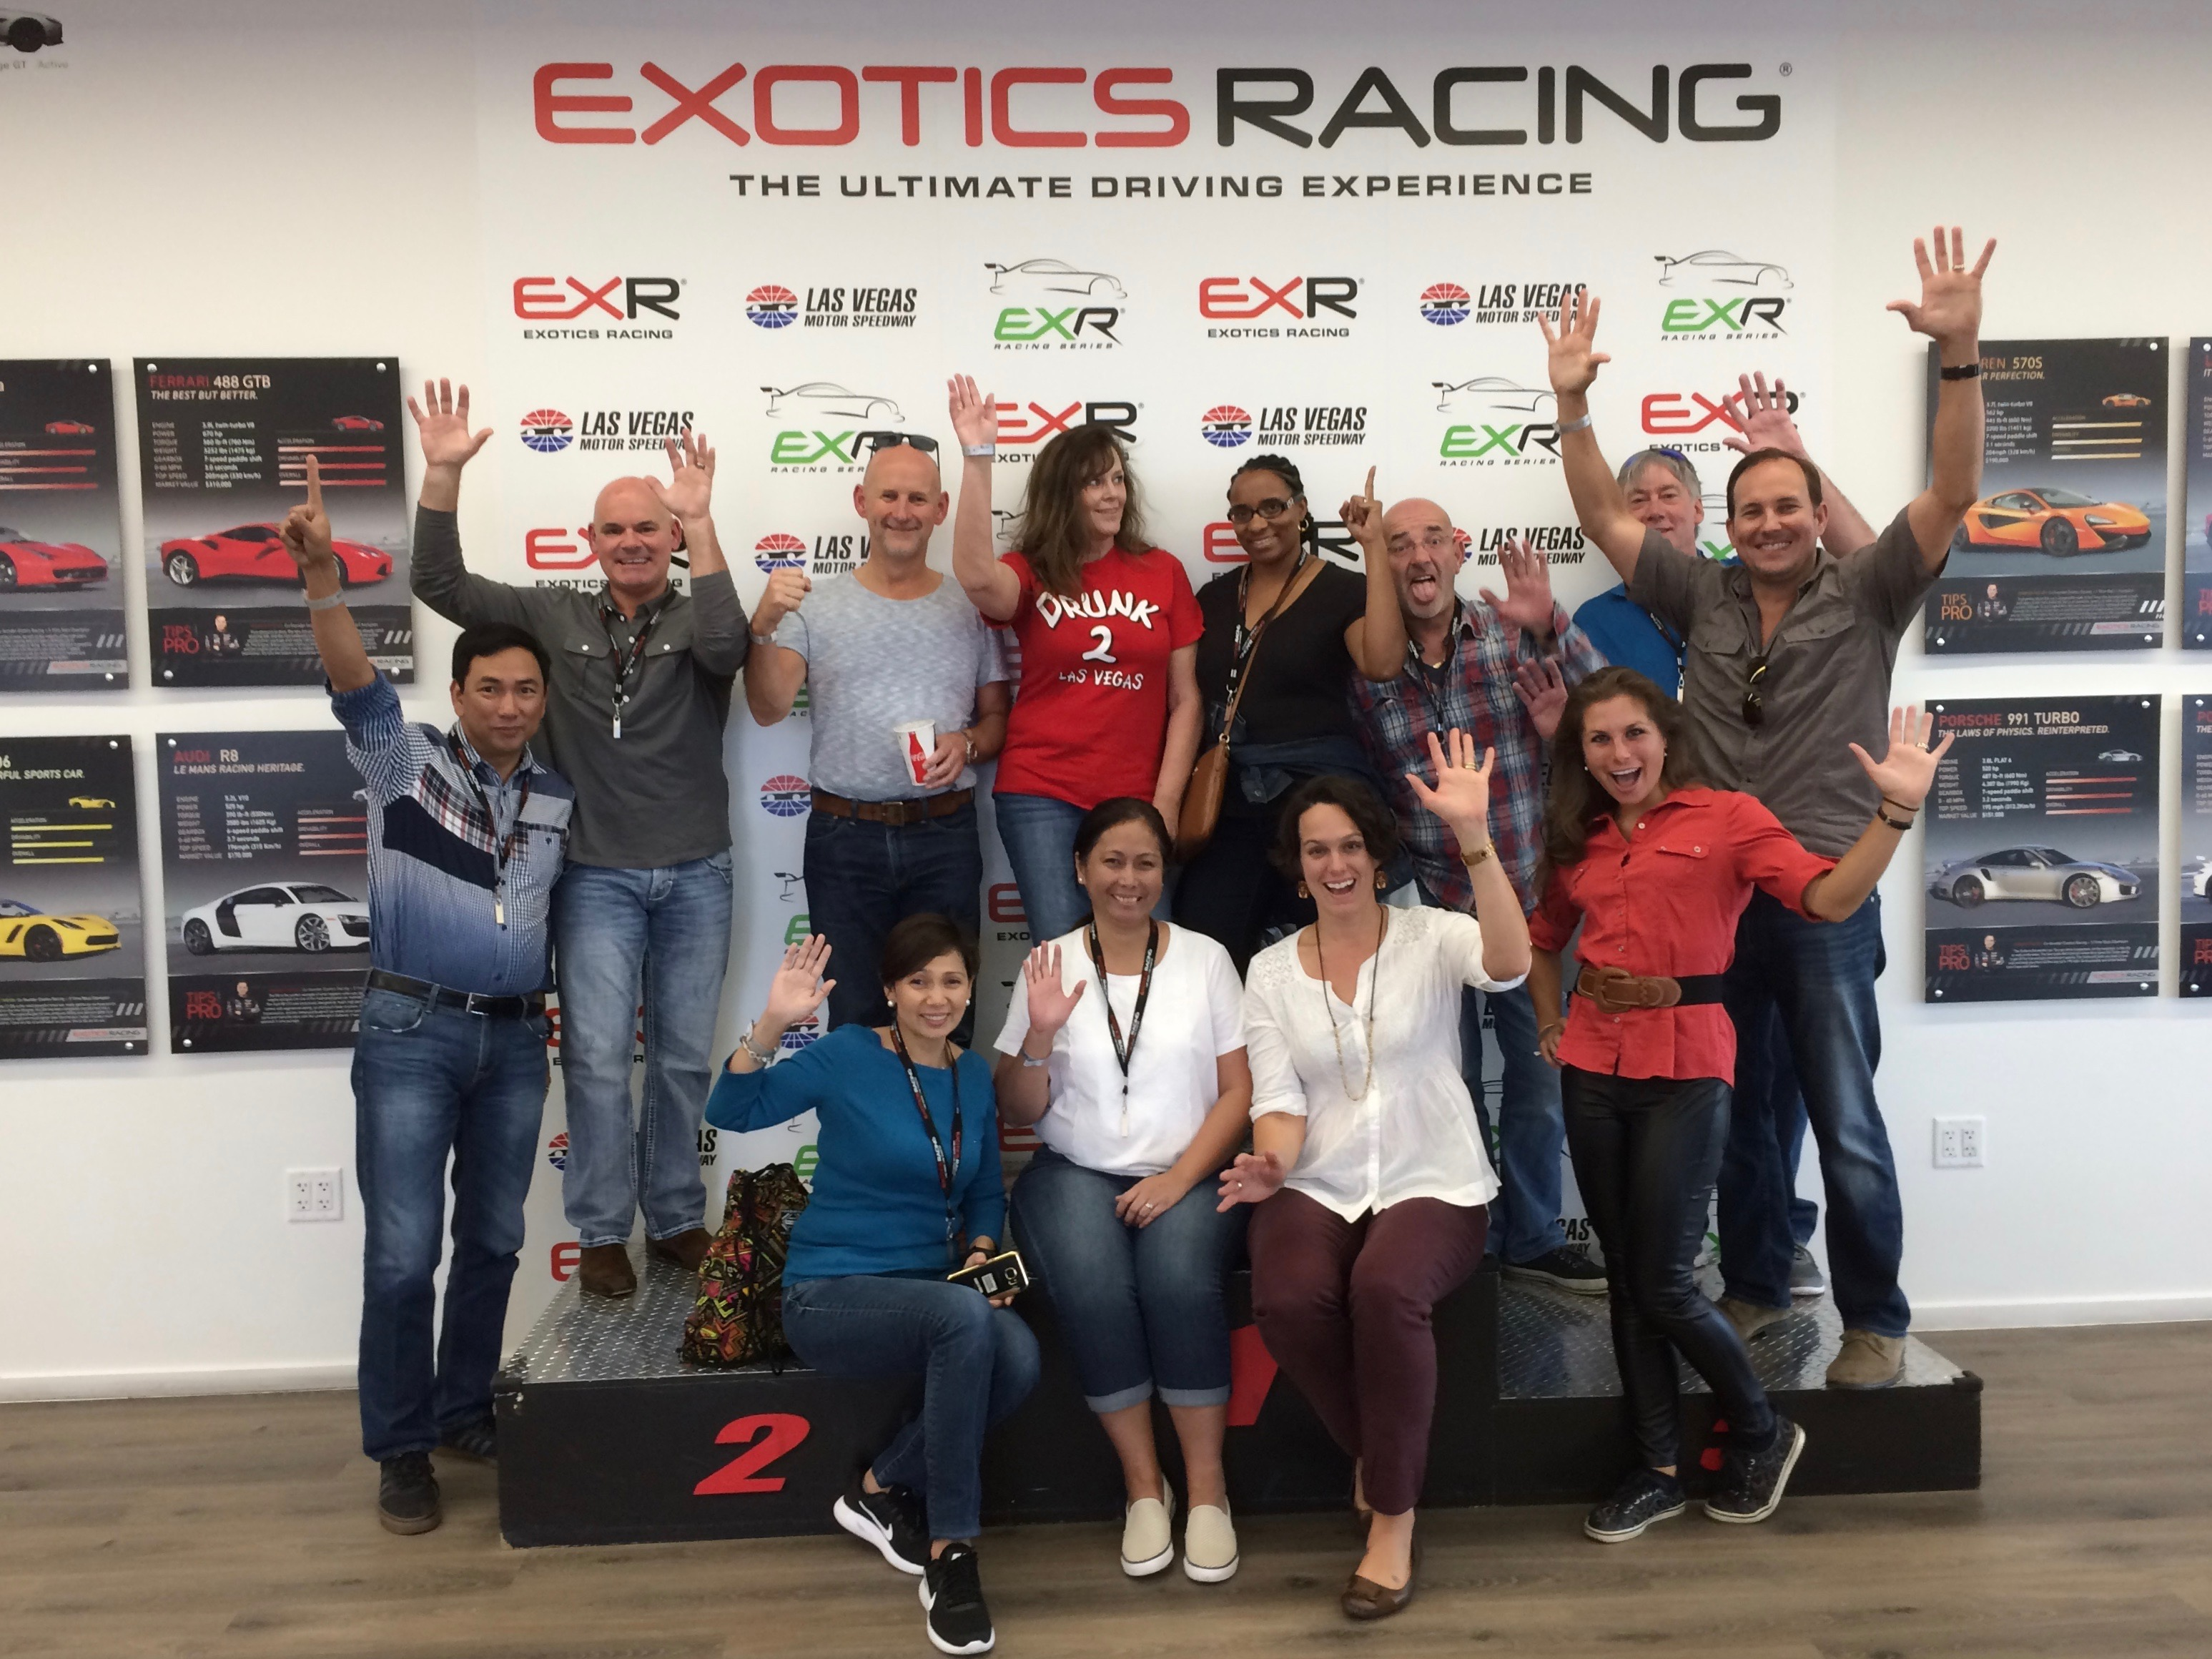 DDC Ex. Summit In Las Vegas Race Car Driving @ Exotics Racing.jpg